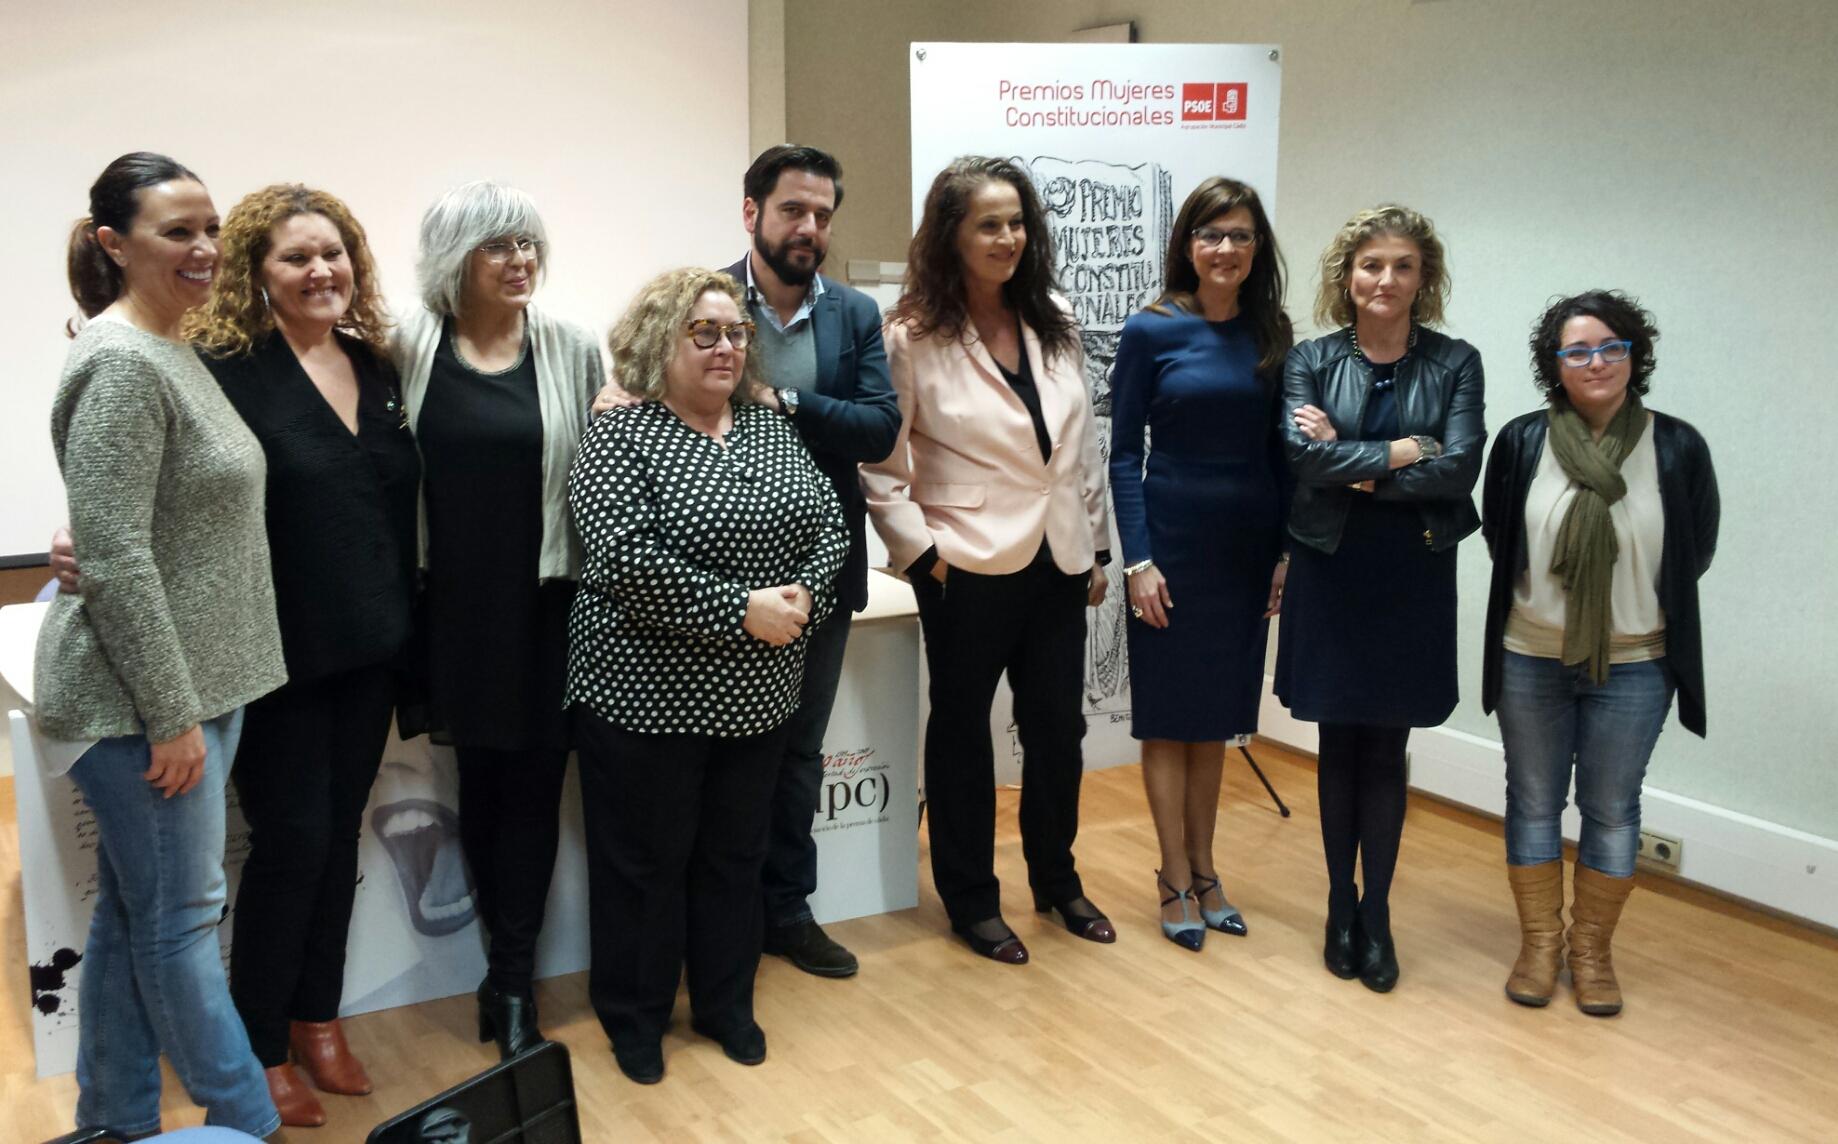 premios-mujeres-constitucionales-2016